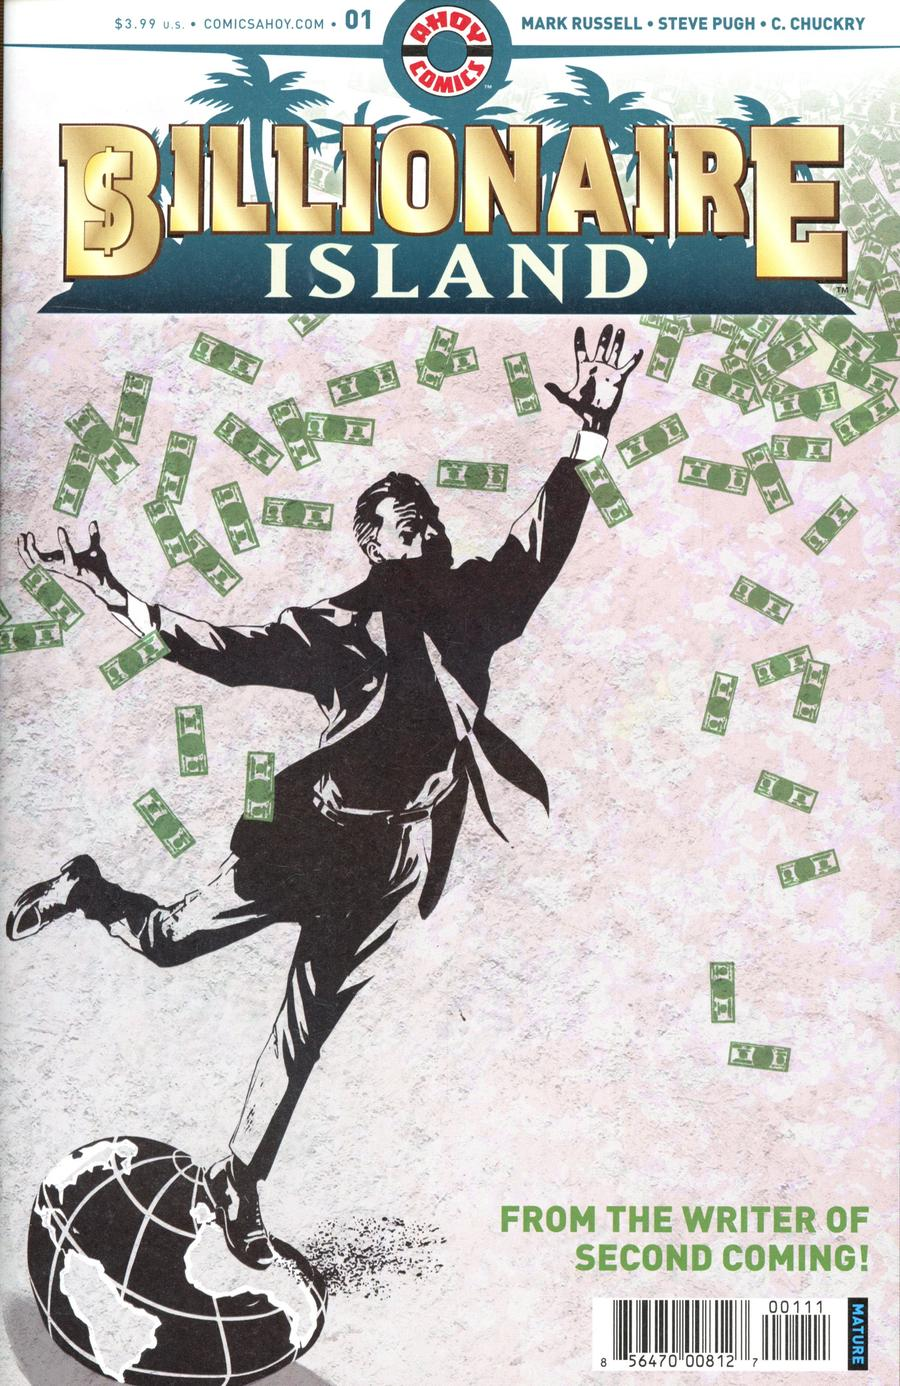 Billionaire Island #1 Cover A Regular Steve Pugh Cover